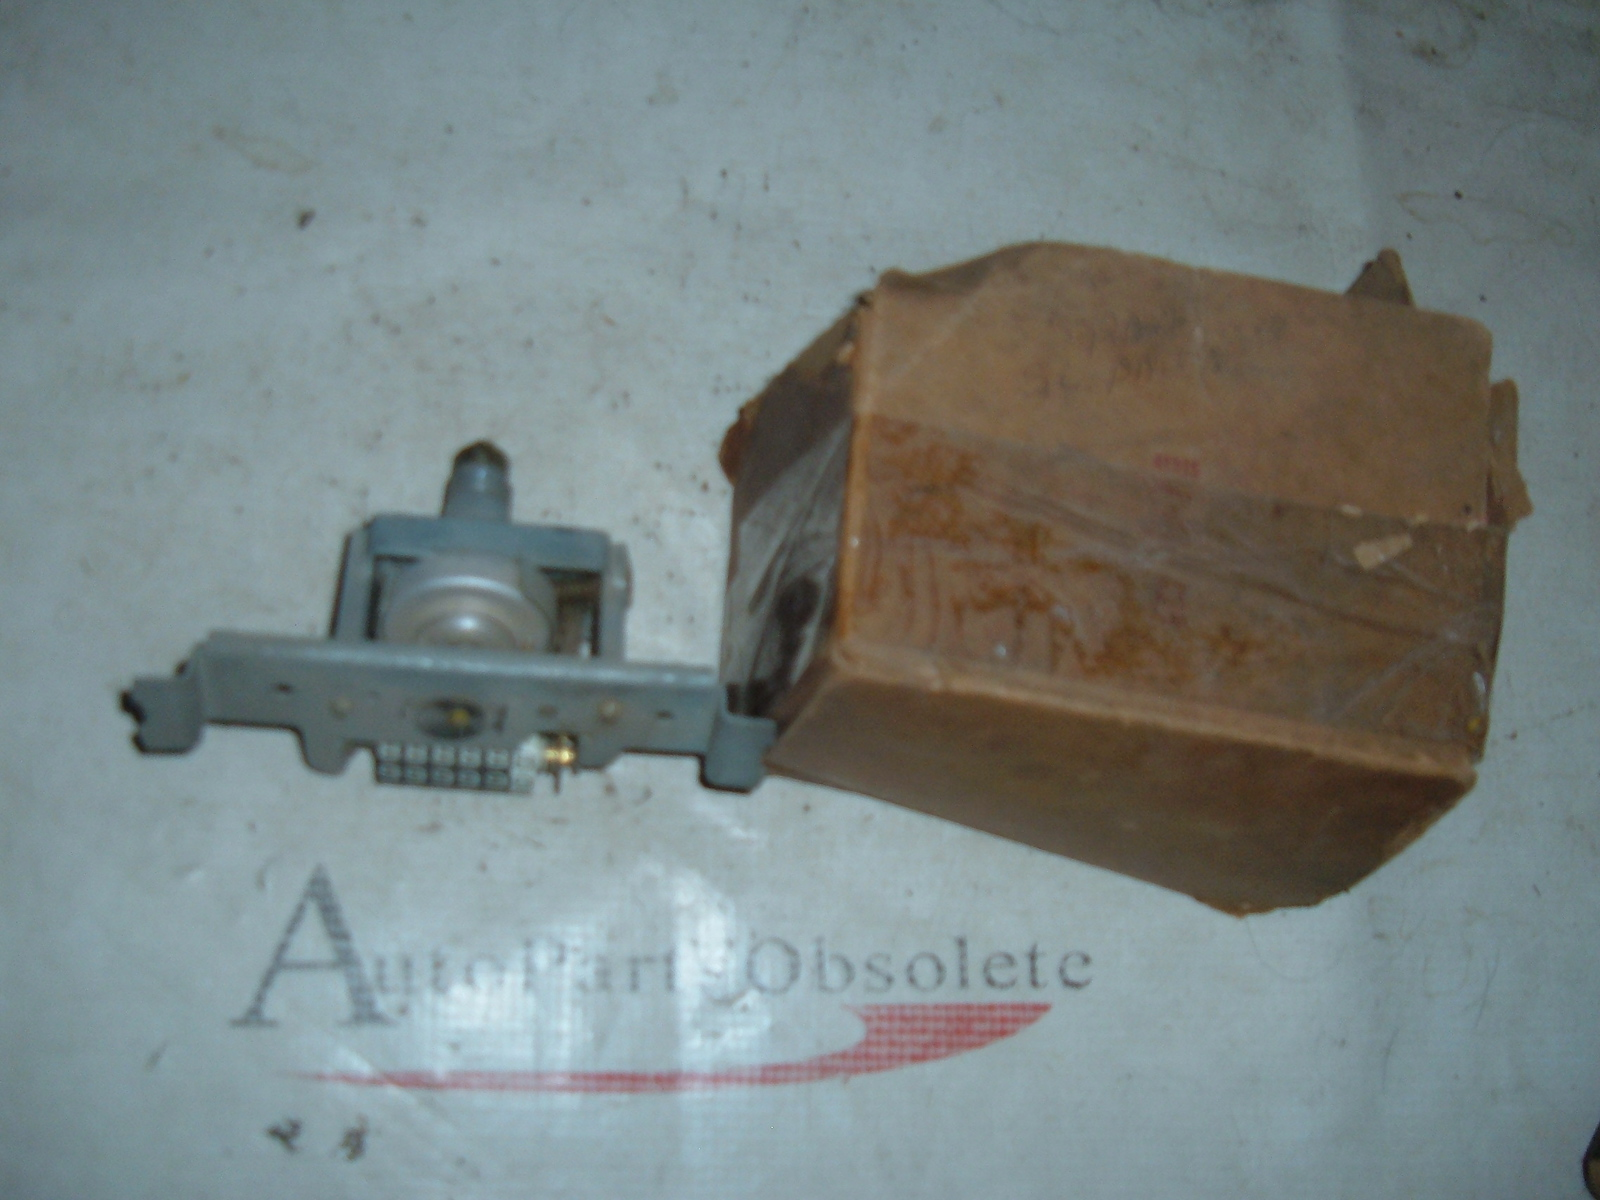 1955 1956 packard speedometer odometer assy nos # 48315 (z 48315)